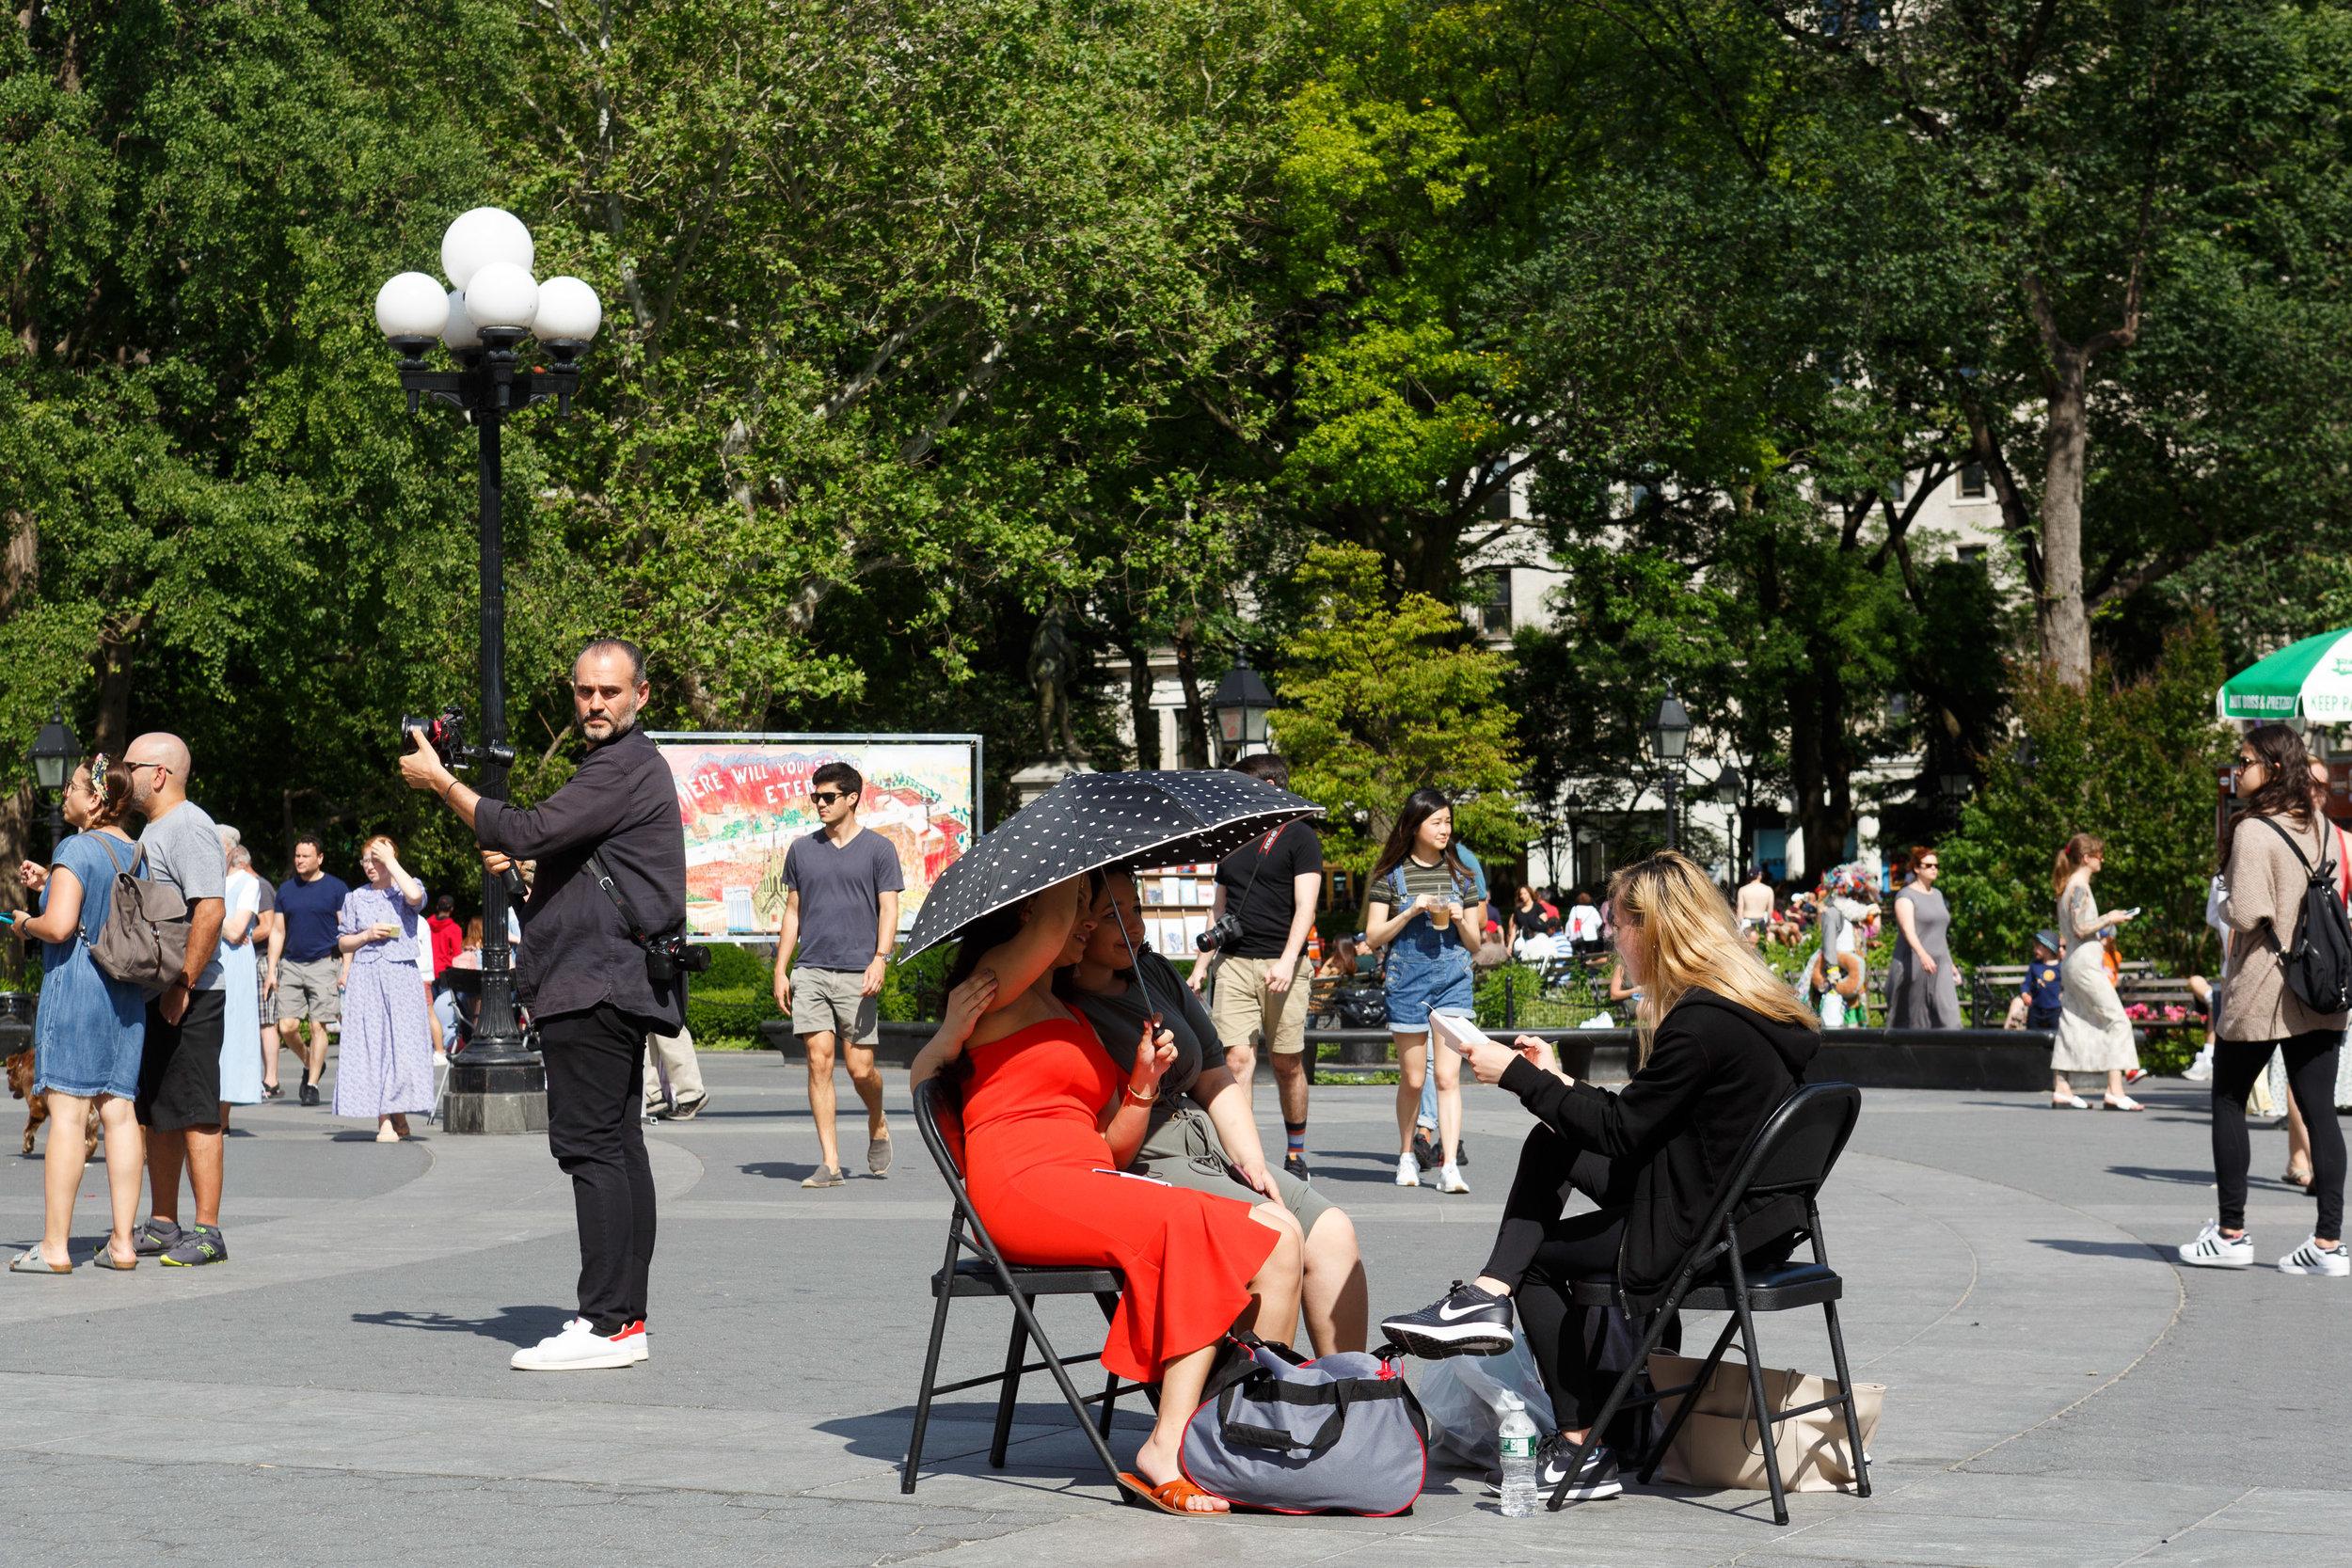 Kiro Rebecca Washington Square Park Marriage Proposal _ Jonathan Heisler _ 6152019 _004.jpg